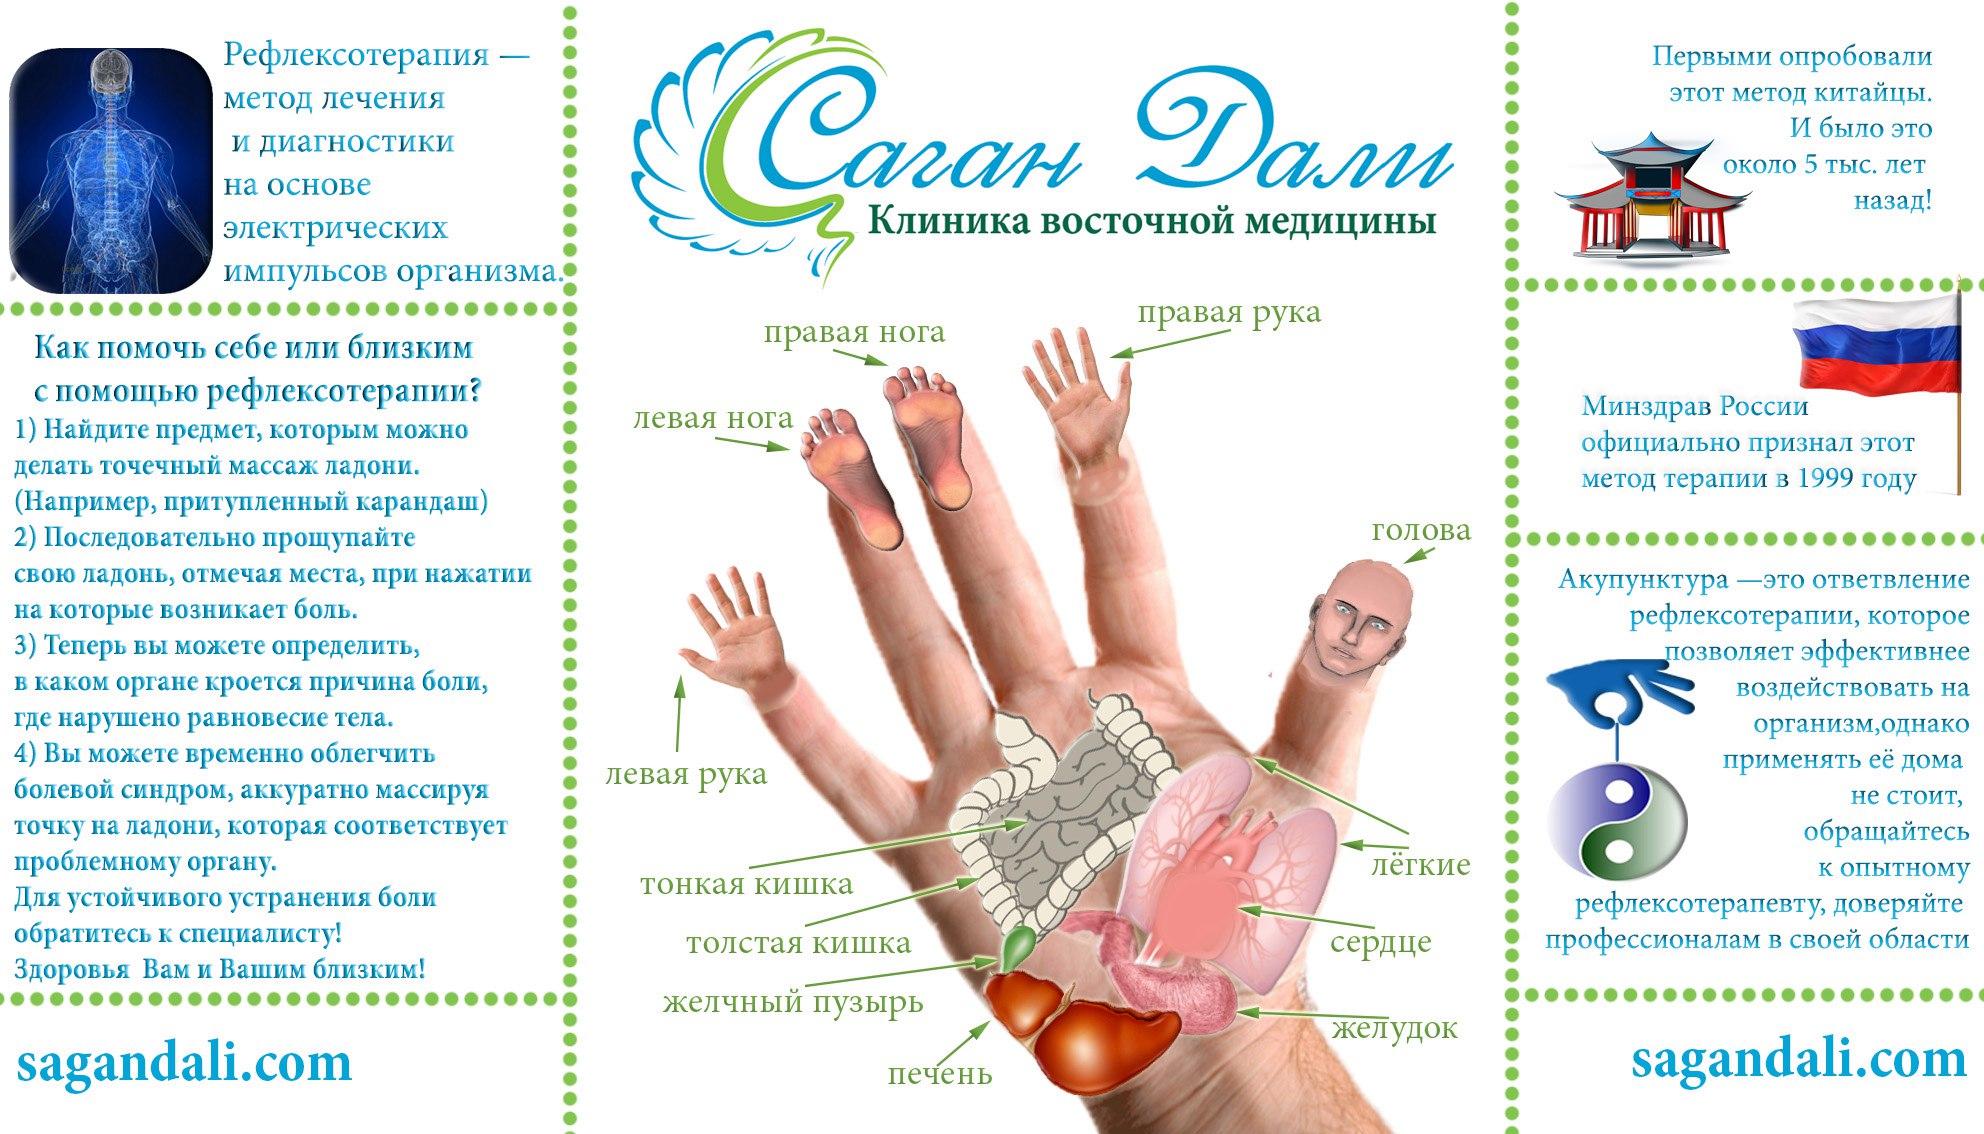 Точки на теле организма. Атлас точек рефлексотерапия. Су джок